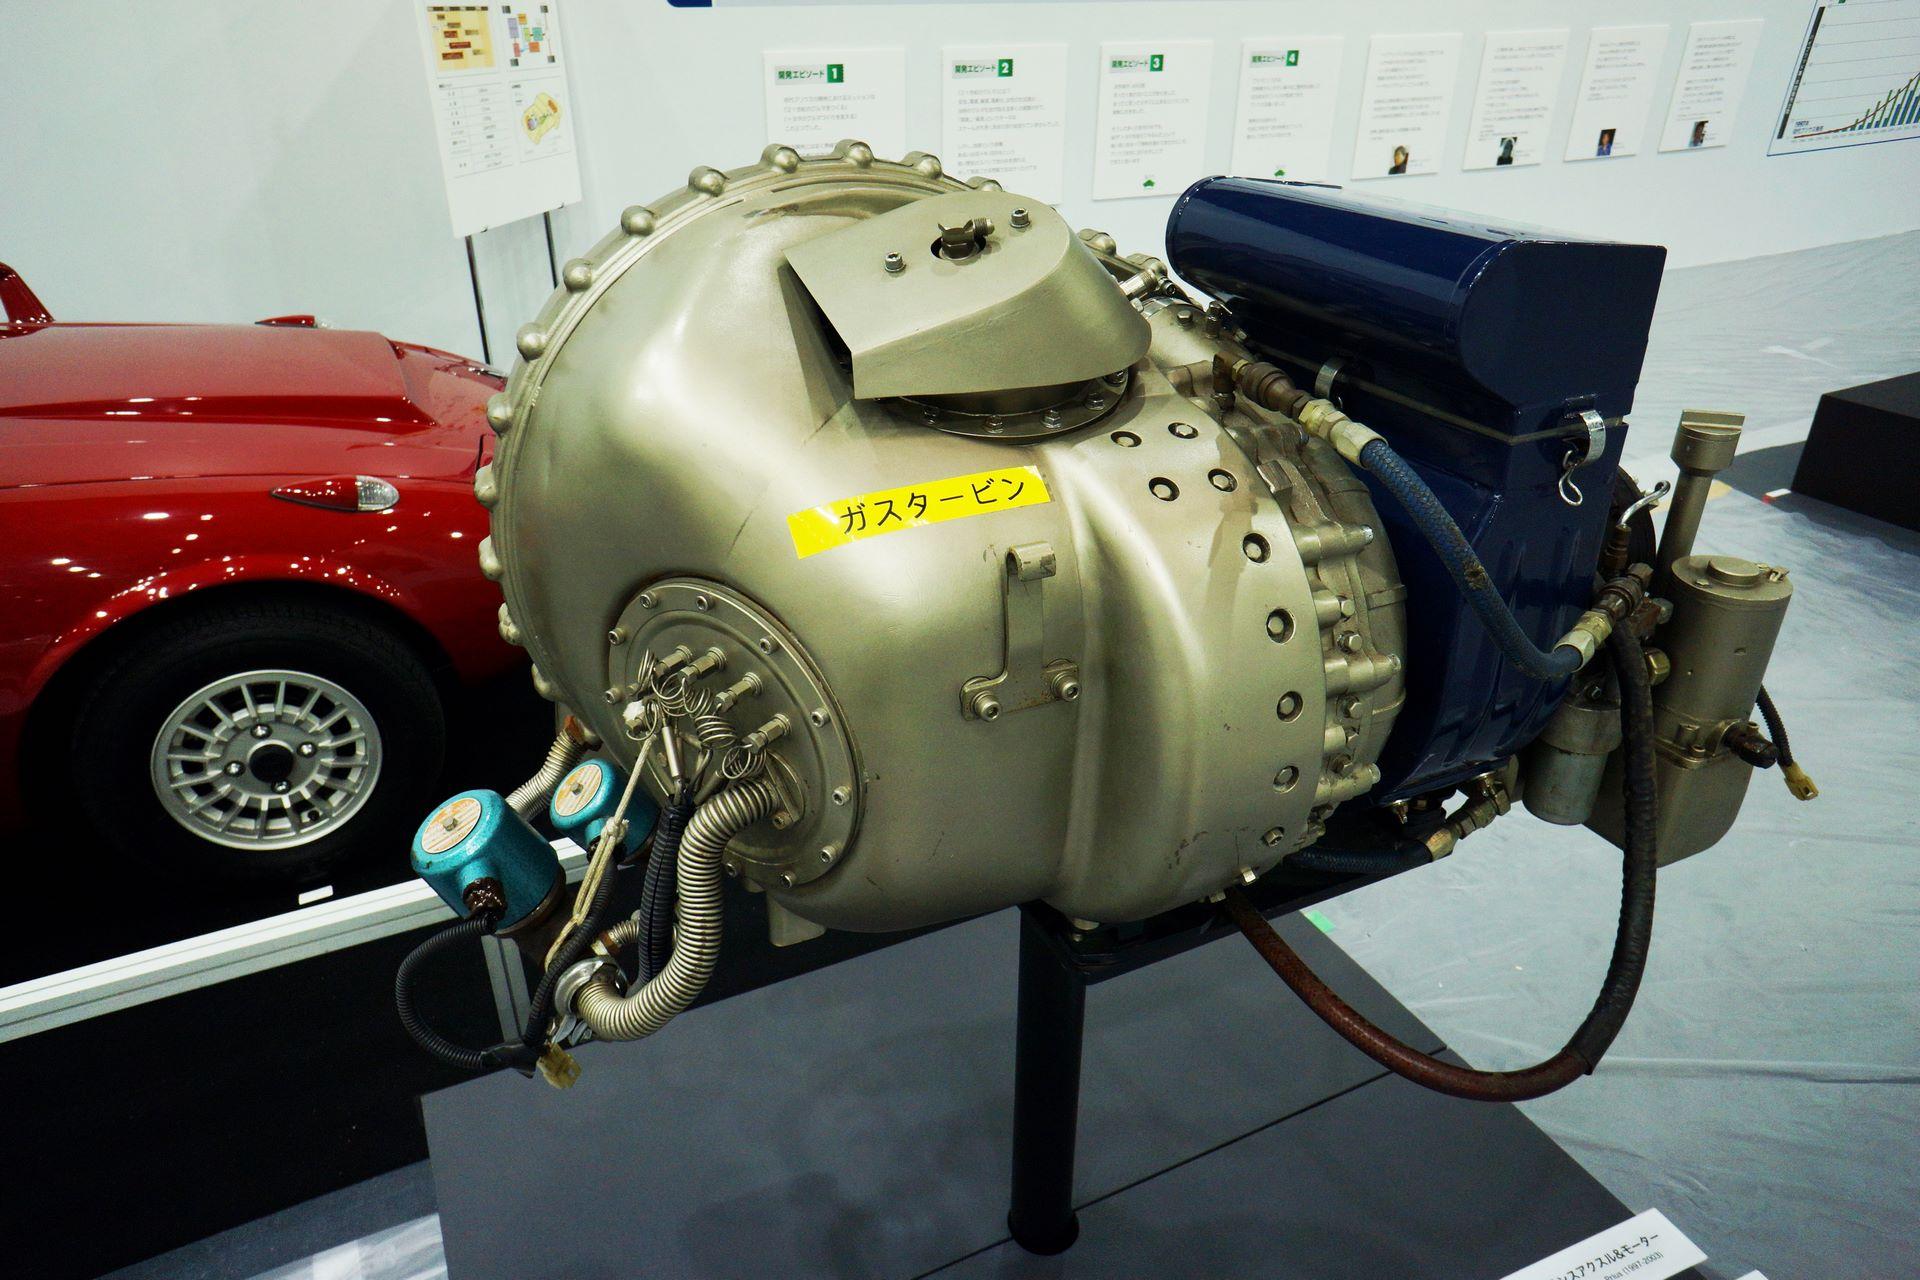 Toyota-Sports-800-Gas-Turbine-Hybrid-concept-1977-27